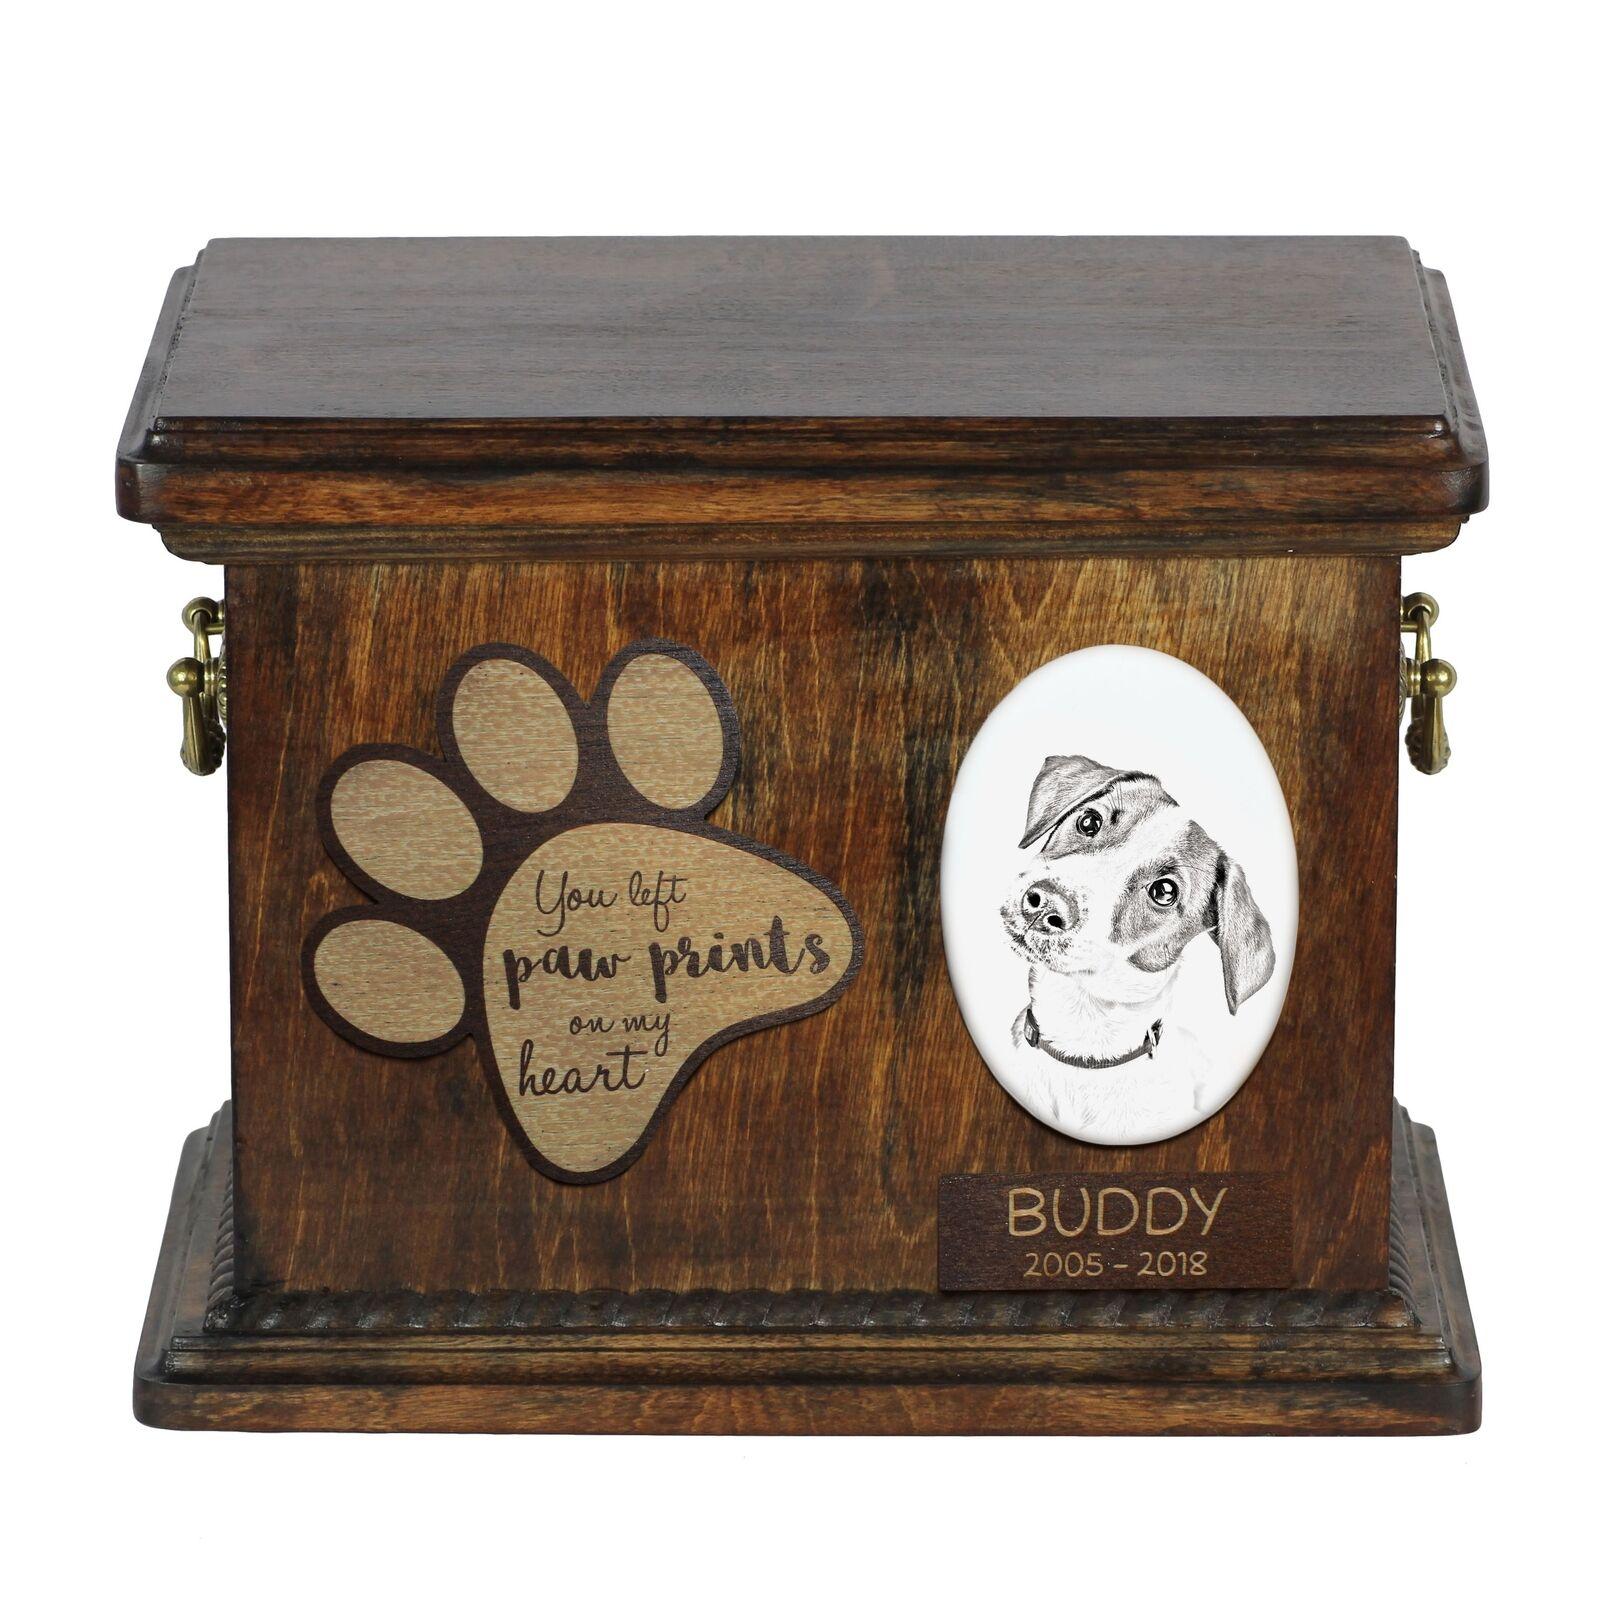 vendita scontata online di factory outlet Jack Russell Terrier Terrier Terrier - Urna per cenere di cane con piatto in ceramica Art Dog IT  outlet online economico